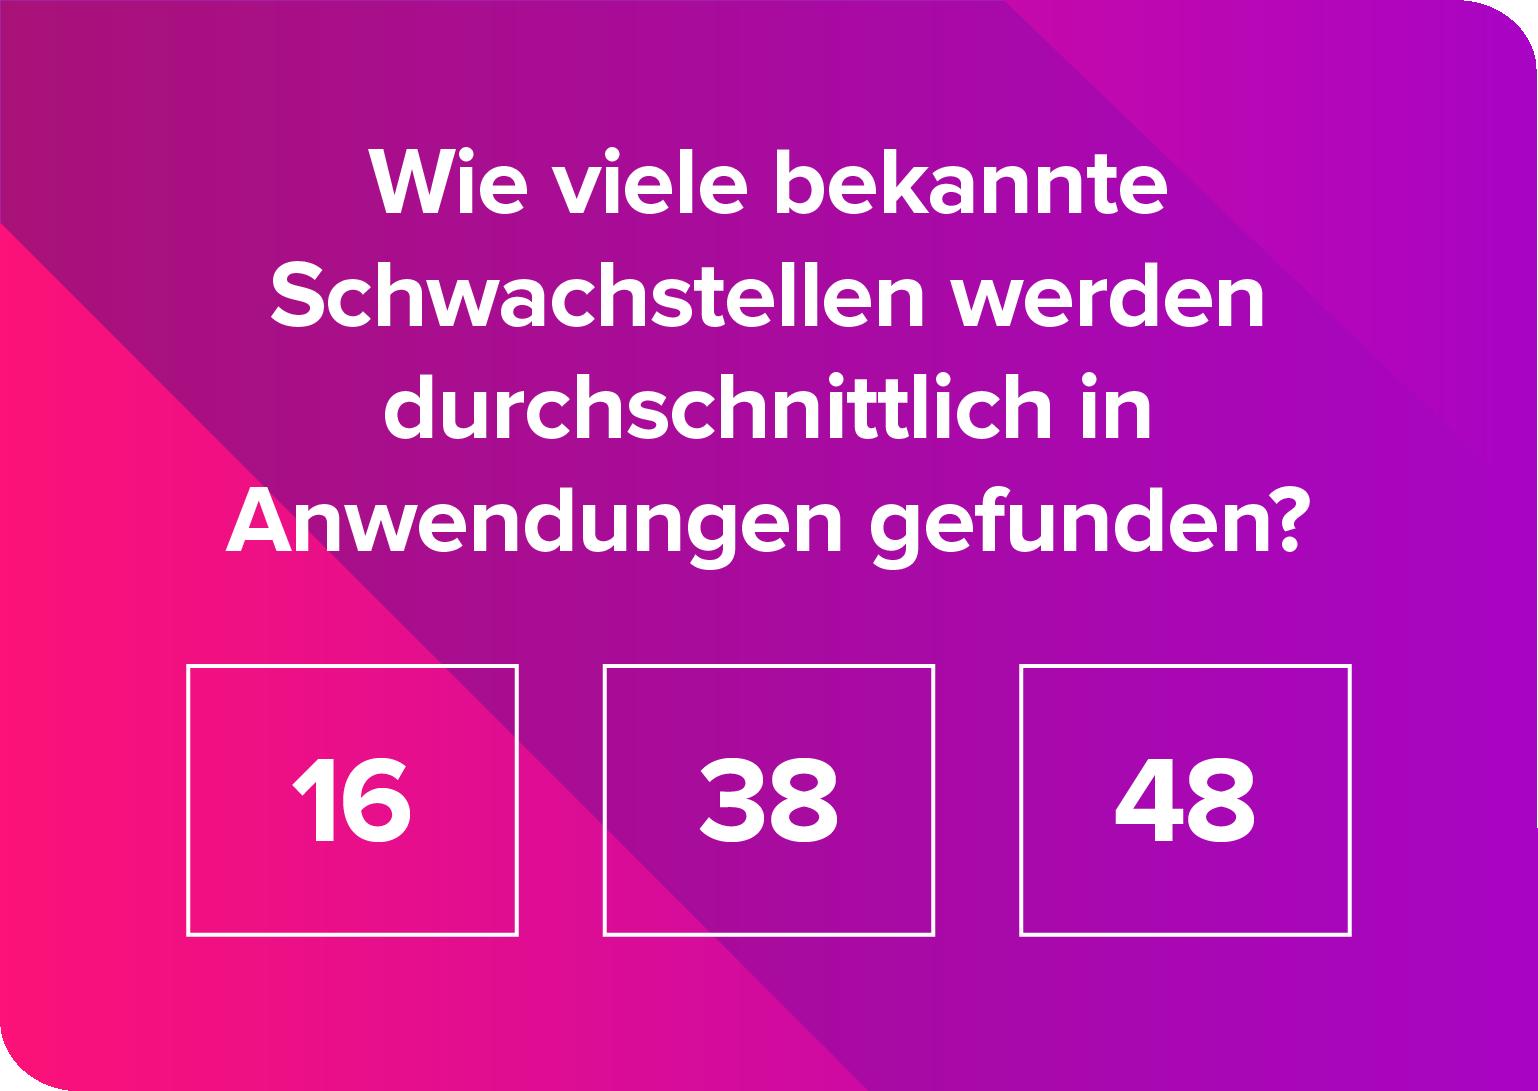 SSC_Question_1@3x